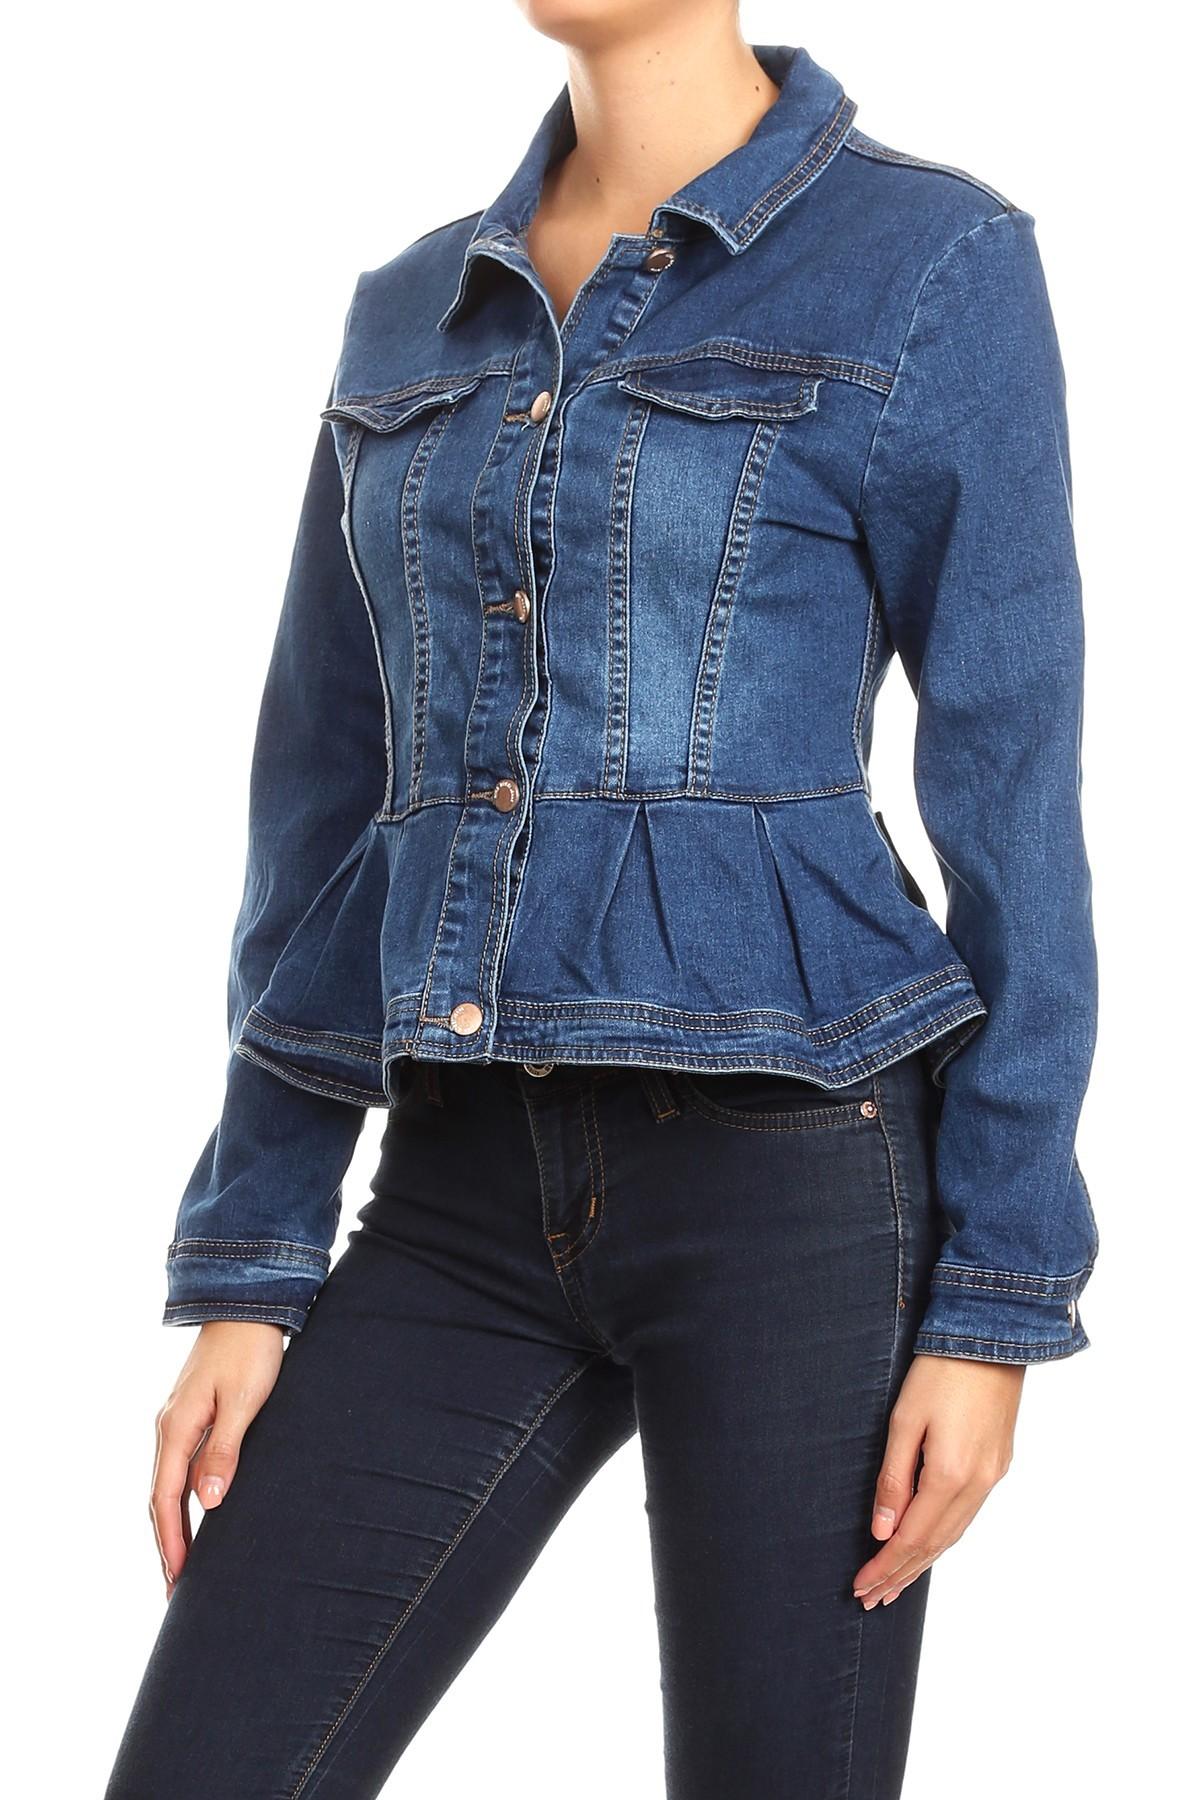 Women-039-s-Juniors-Premium-Denim-Peplum-Bodice-Long-Sleeve-Jacket thumbnail 8